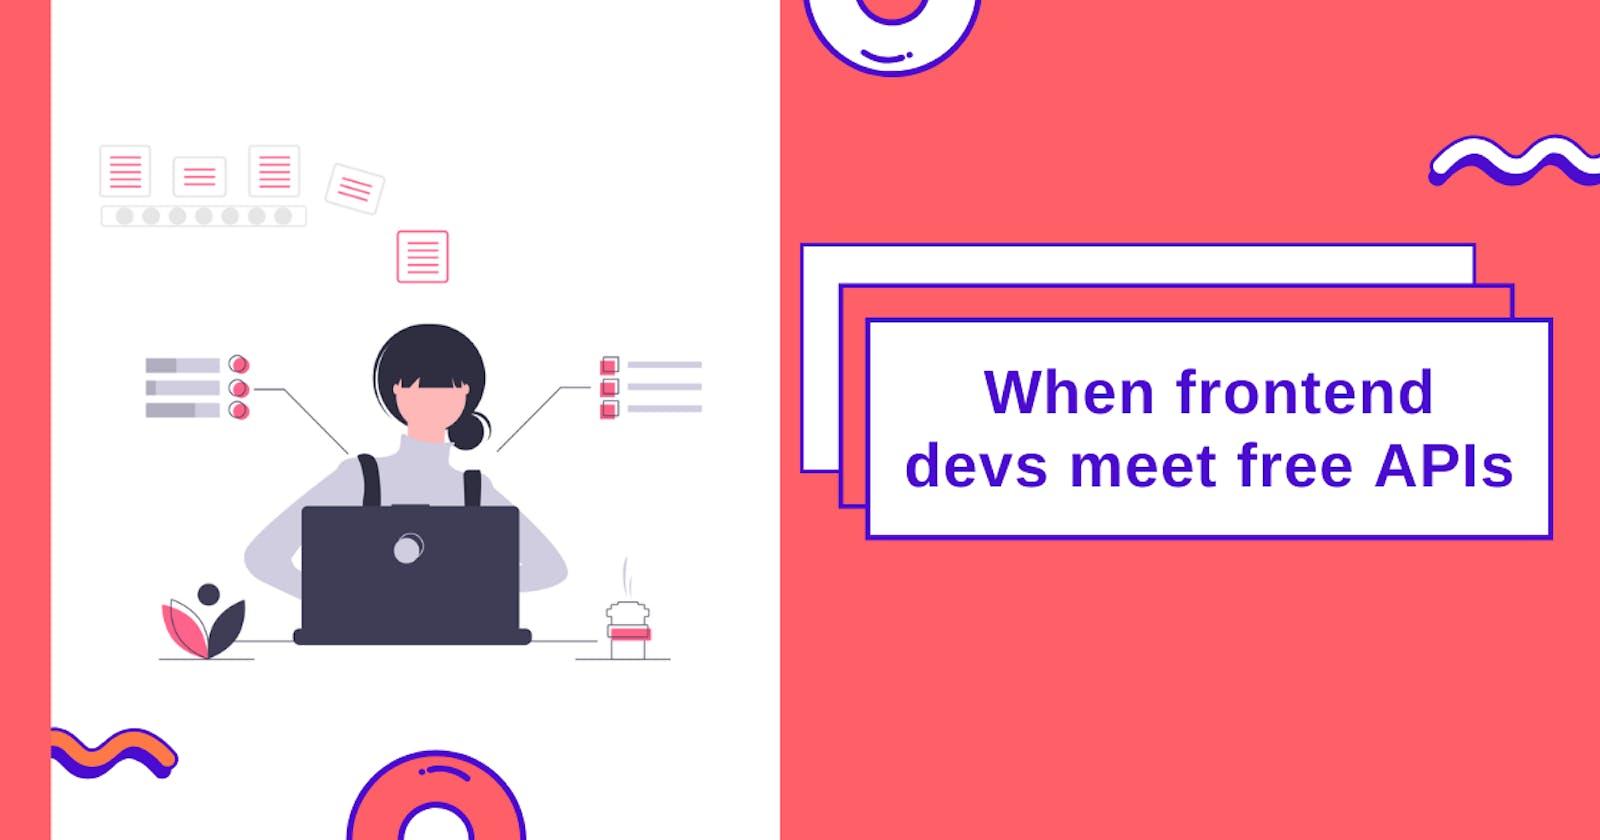 When frontend devs meet free APIs